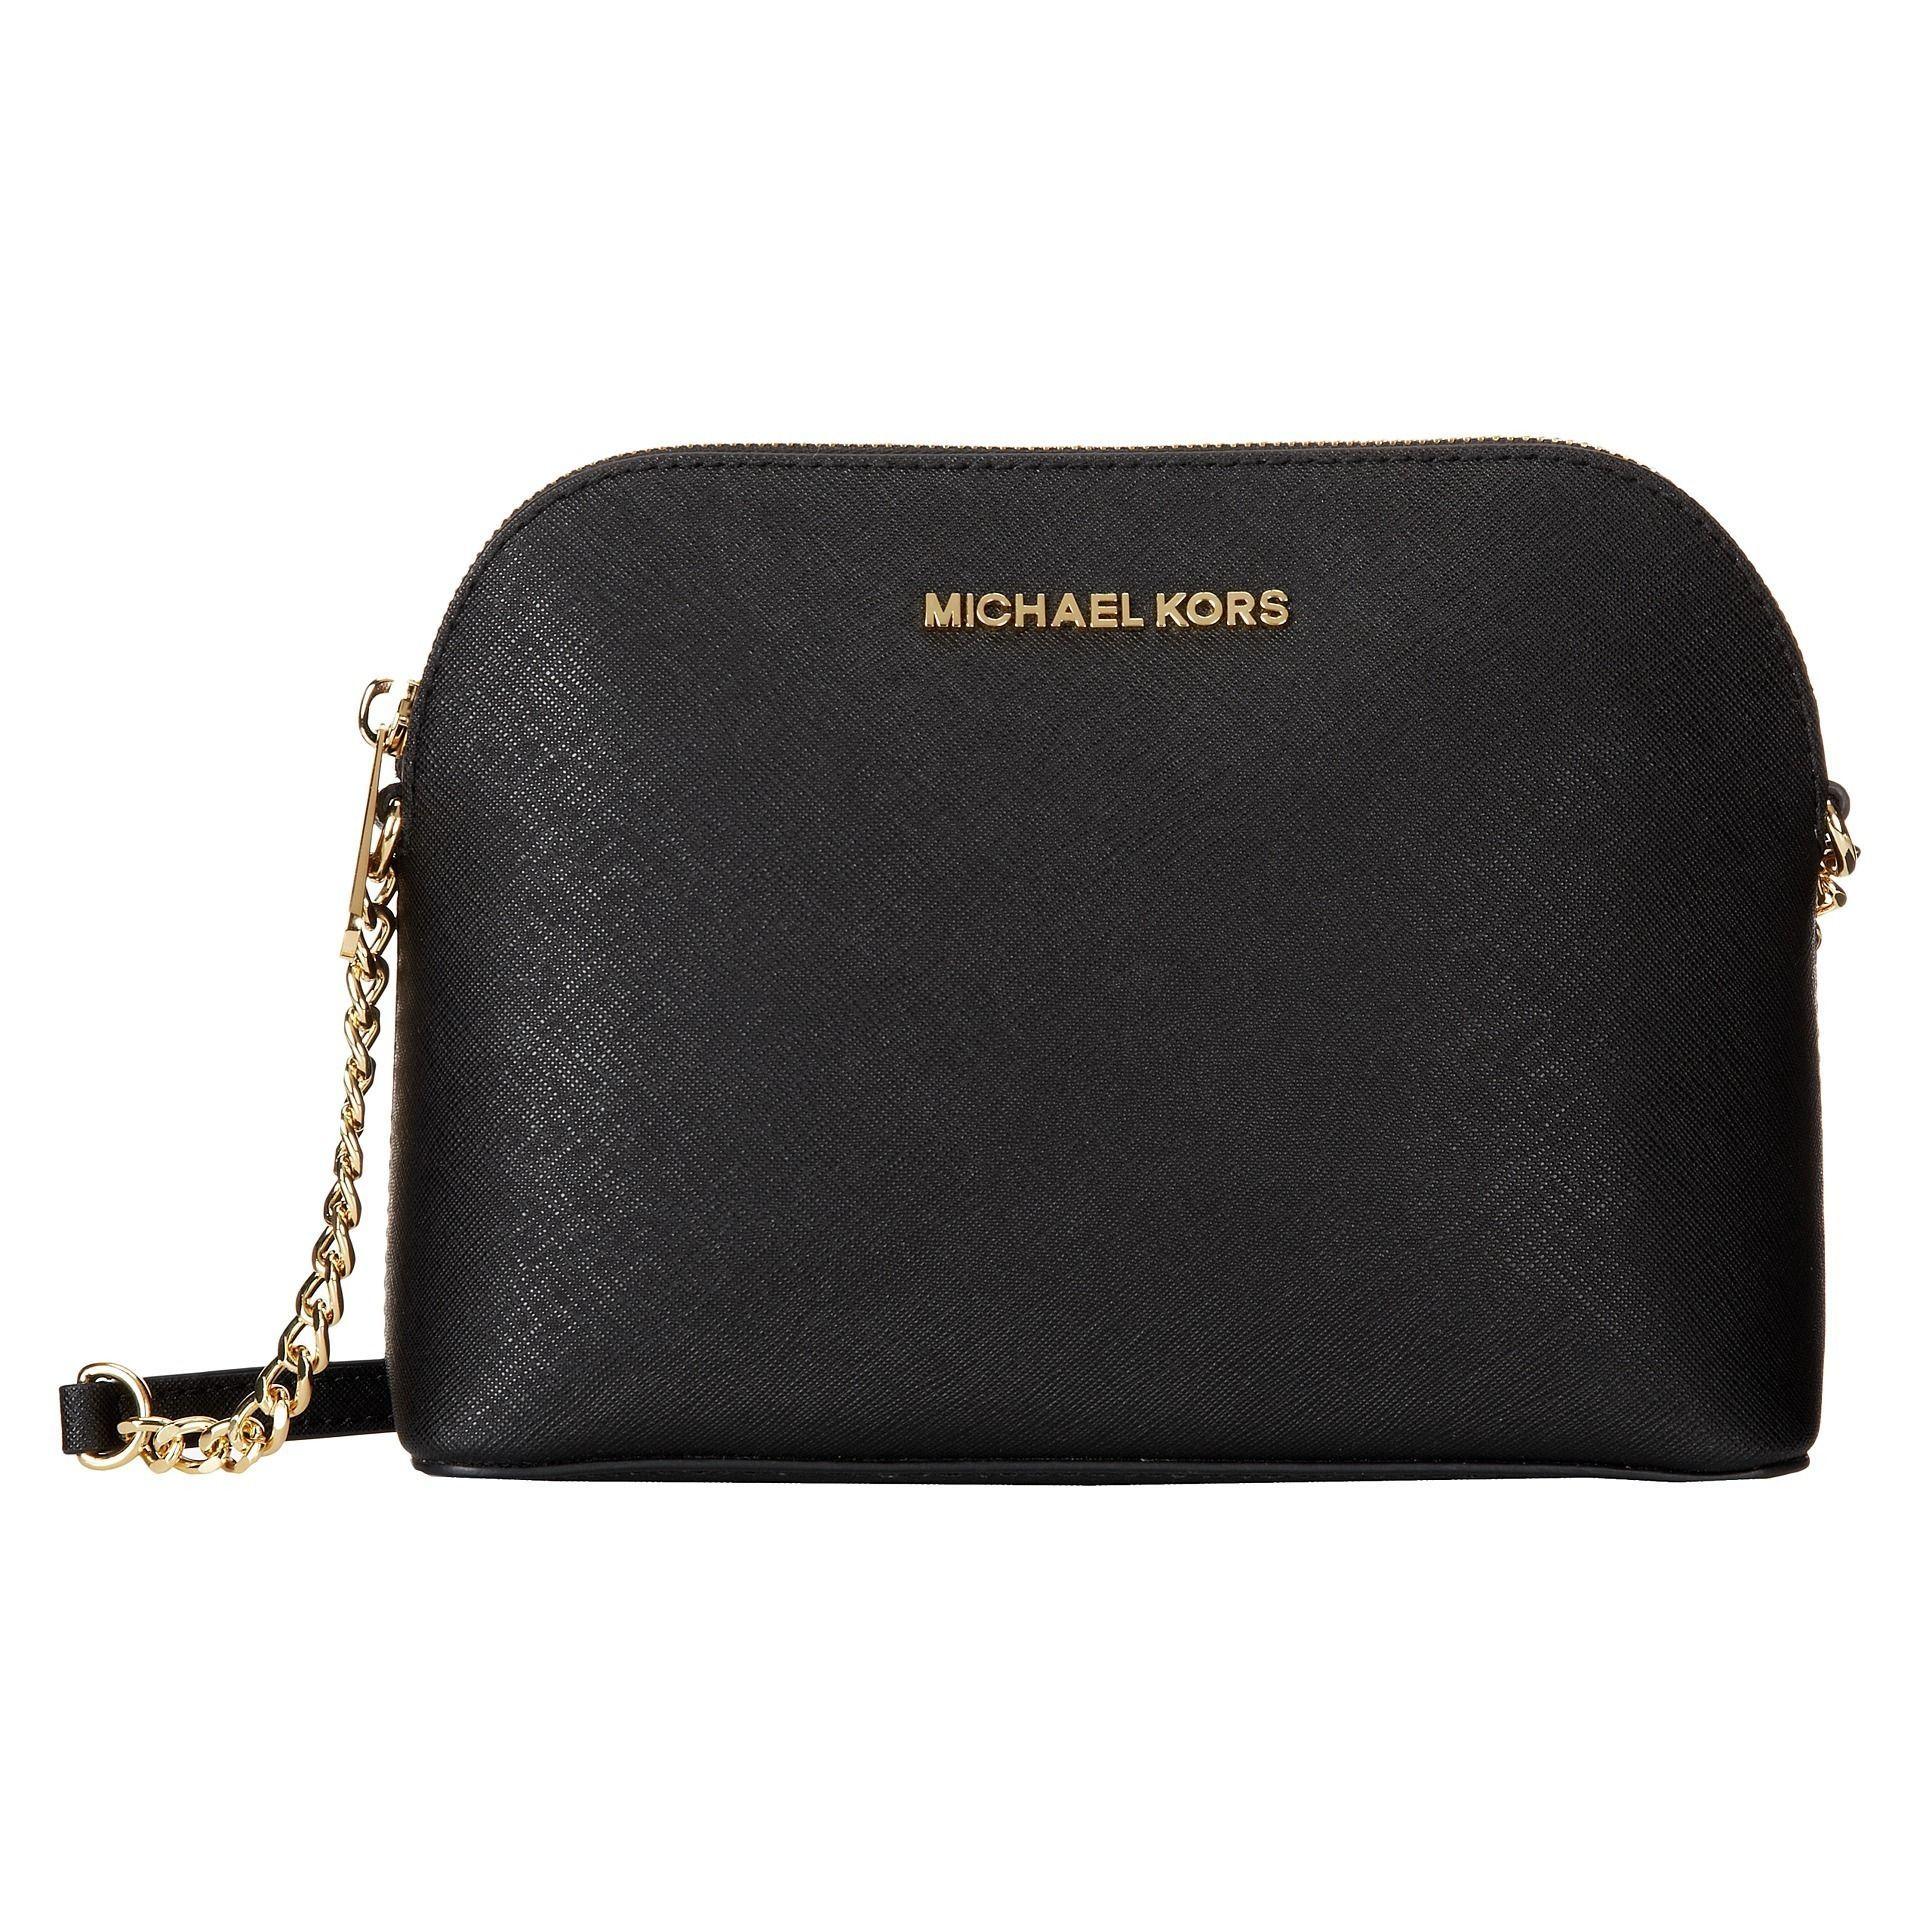 0c26fc92da44 Michael Michael Kors Cindy Black  Gold Saffiano Leather Dome Handbag (Black  Gold)